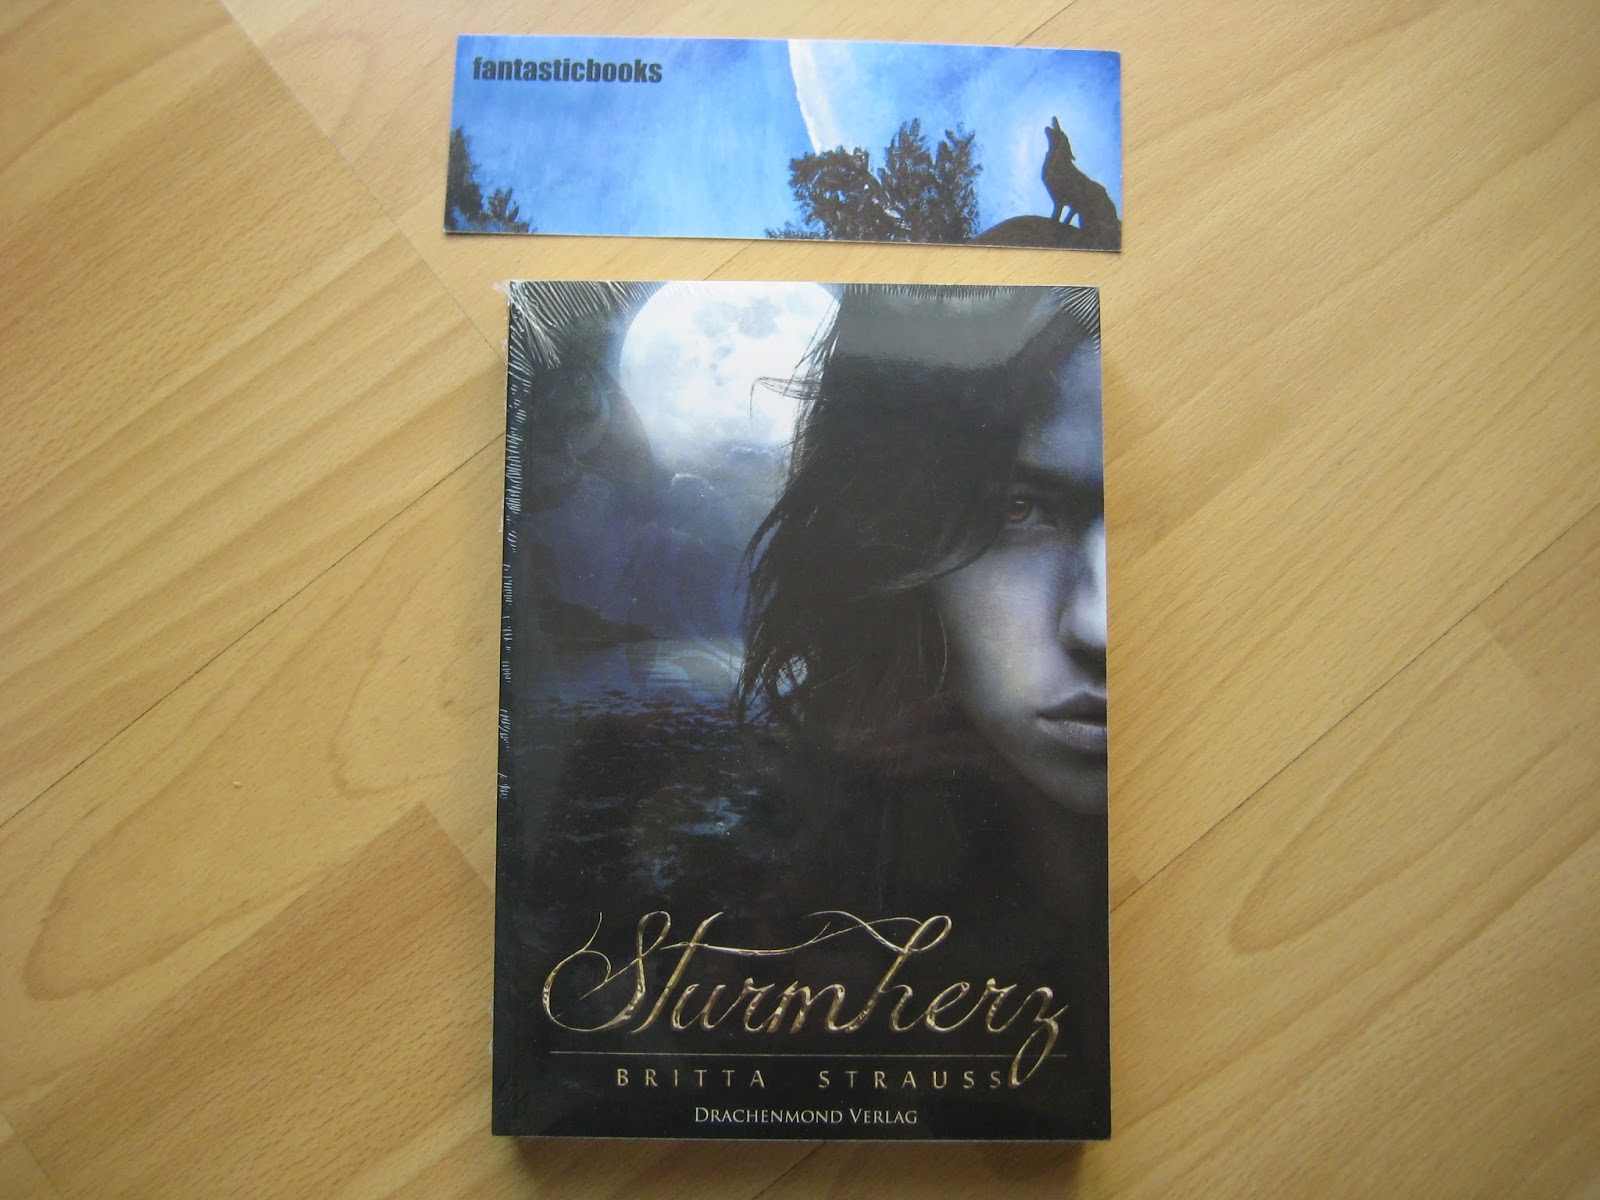 http://www.drachenmond.de/?s=sturmherz